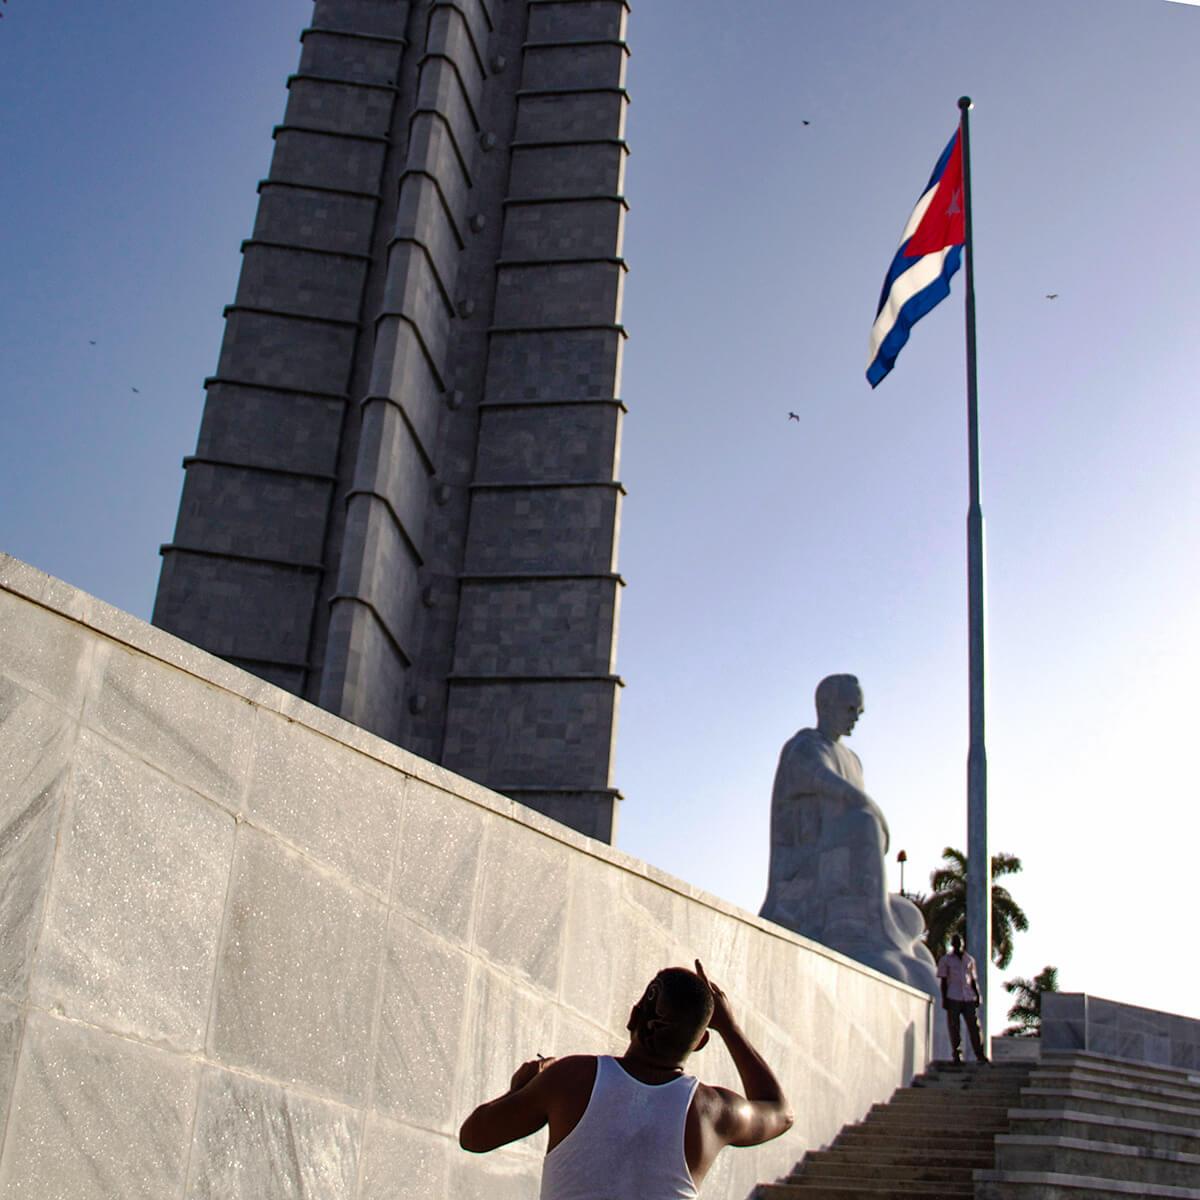 Cuban guy in Plaza de la Revolucion, Havana